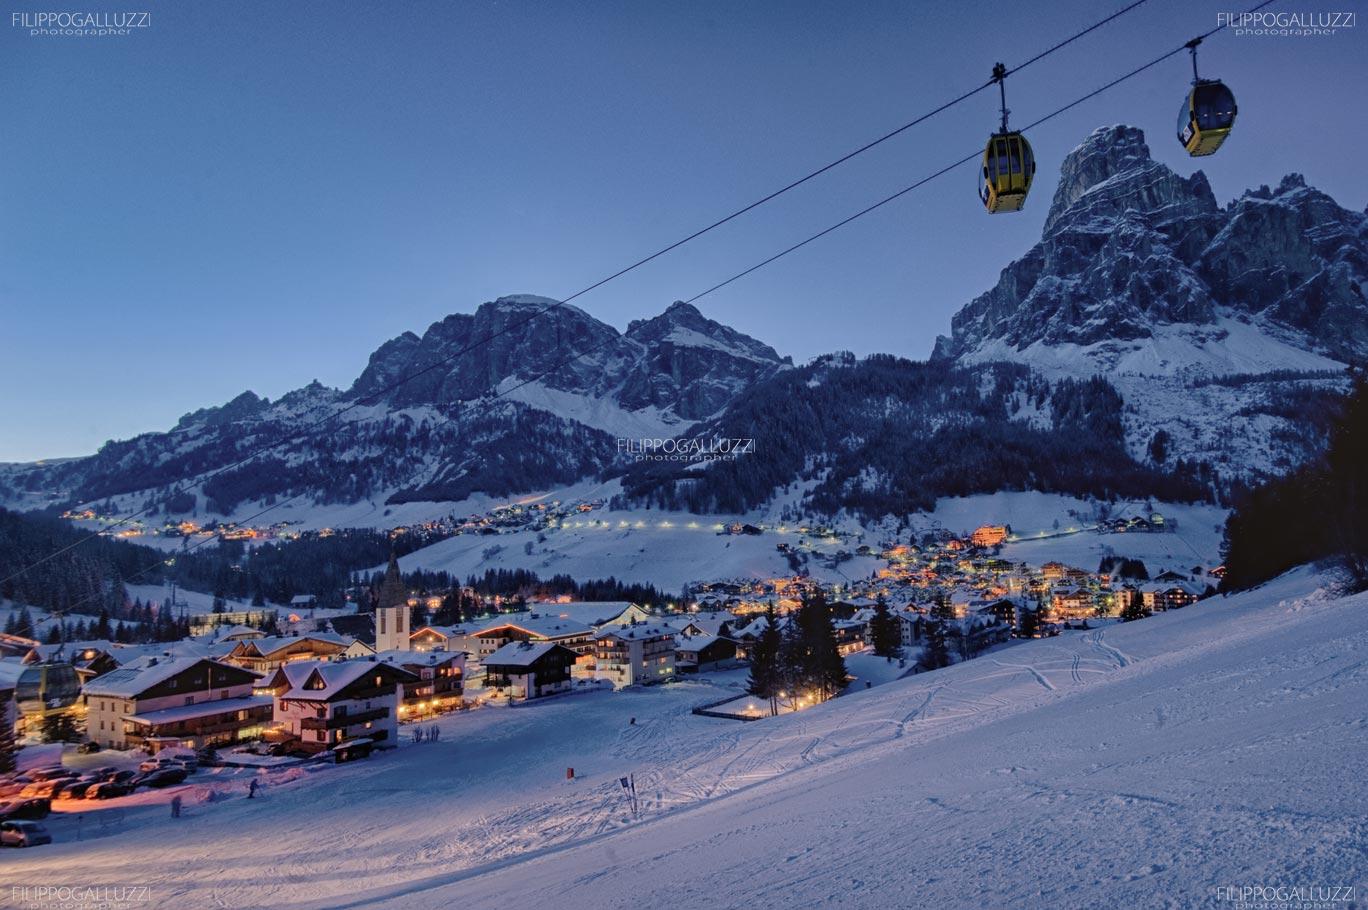 Dolomiti, vista notturna su Corvara, Alta Badia